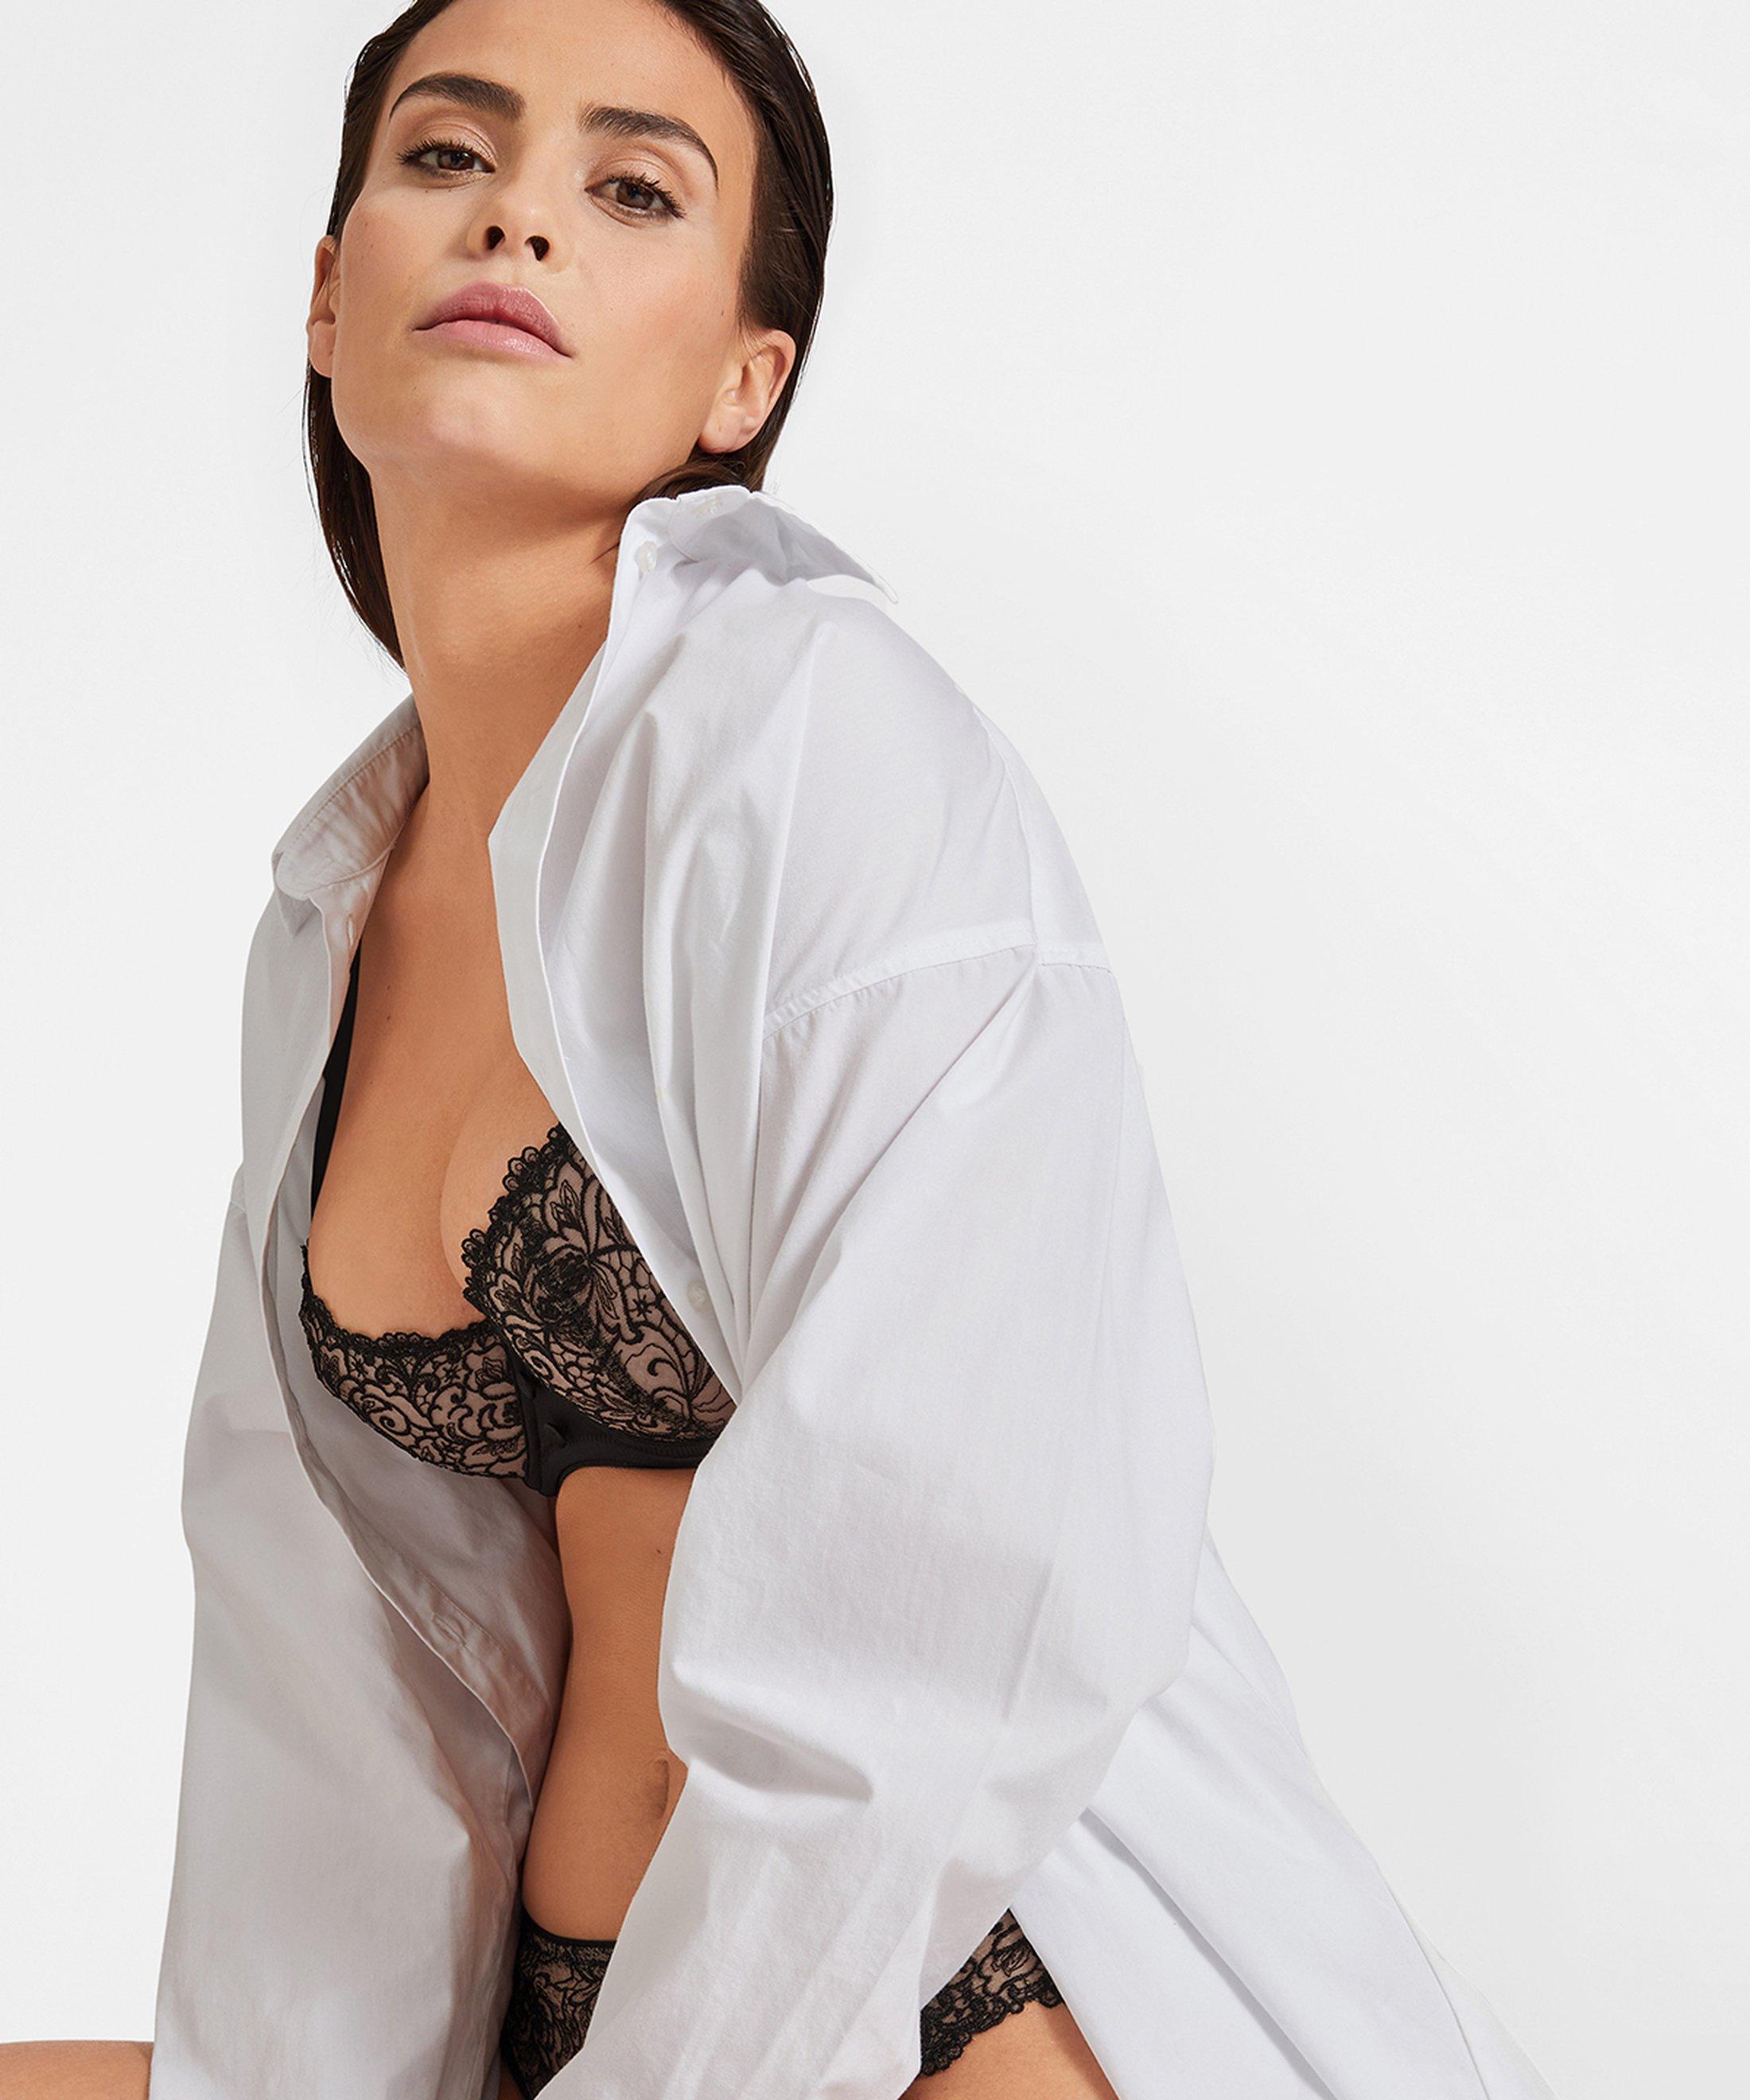 KARL LAGERFELD X AUBADE Soutien-gorge corbeille Noir Tuxedo | Aubade